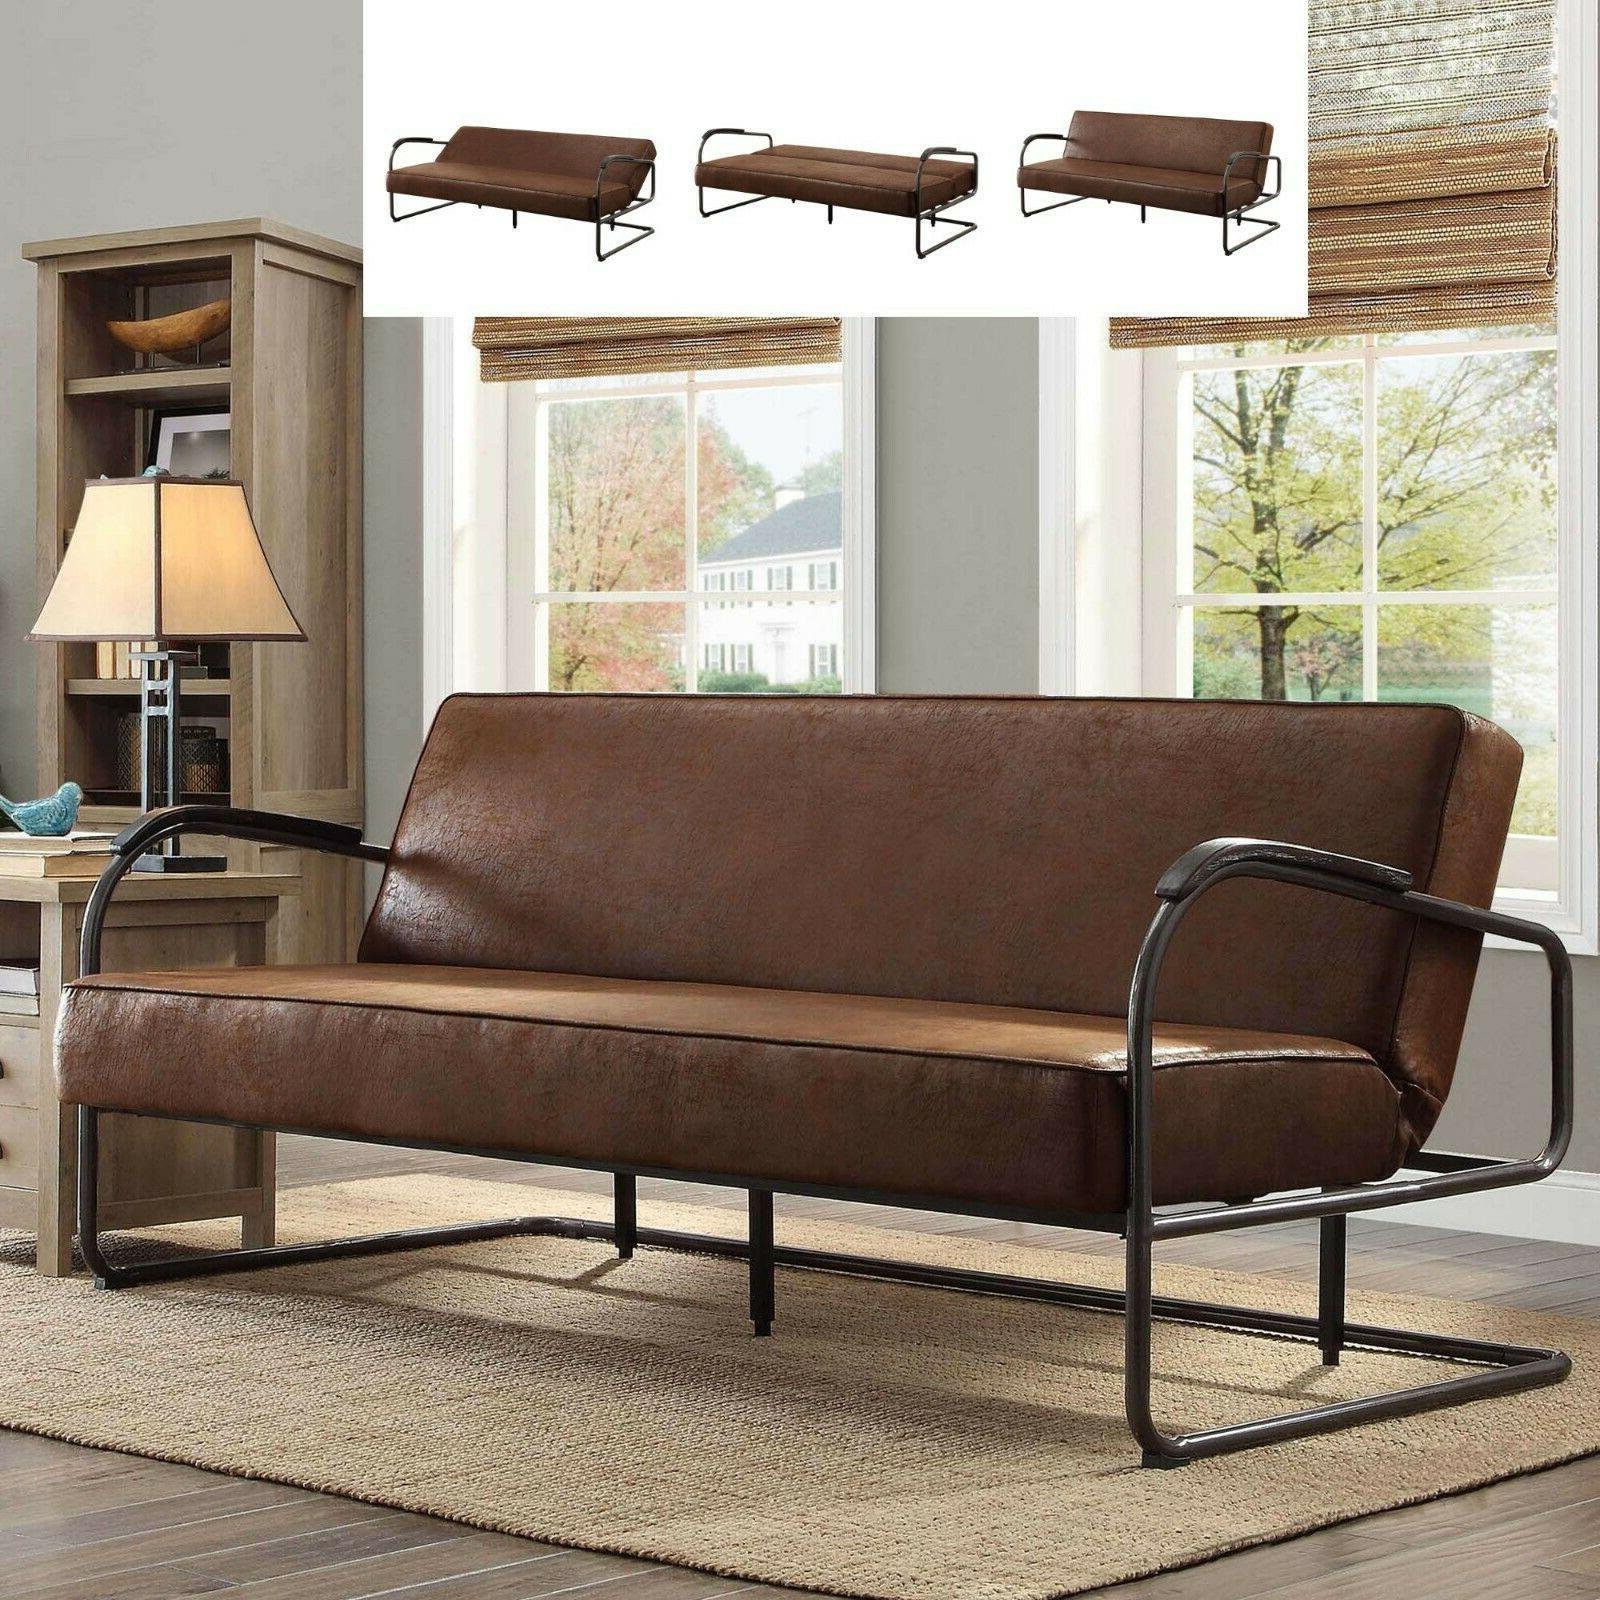 Rustic Futon Sofa Bed Sleeper Full Faux Leather Loveseat Liv